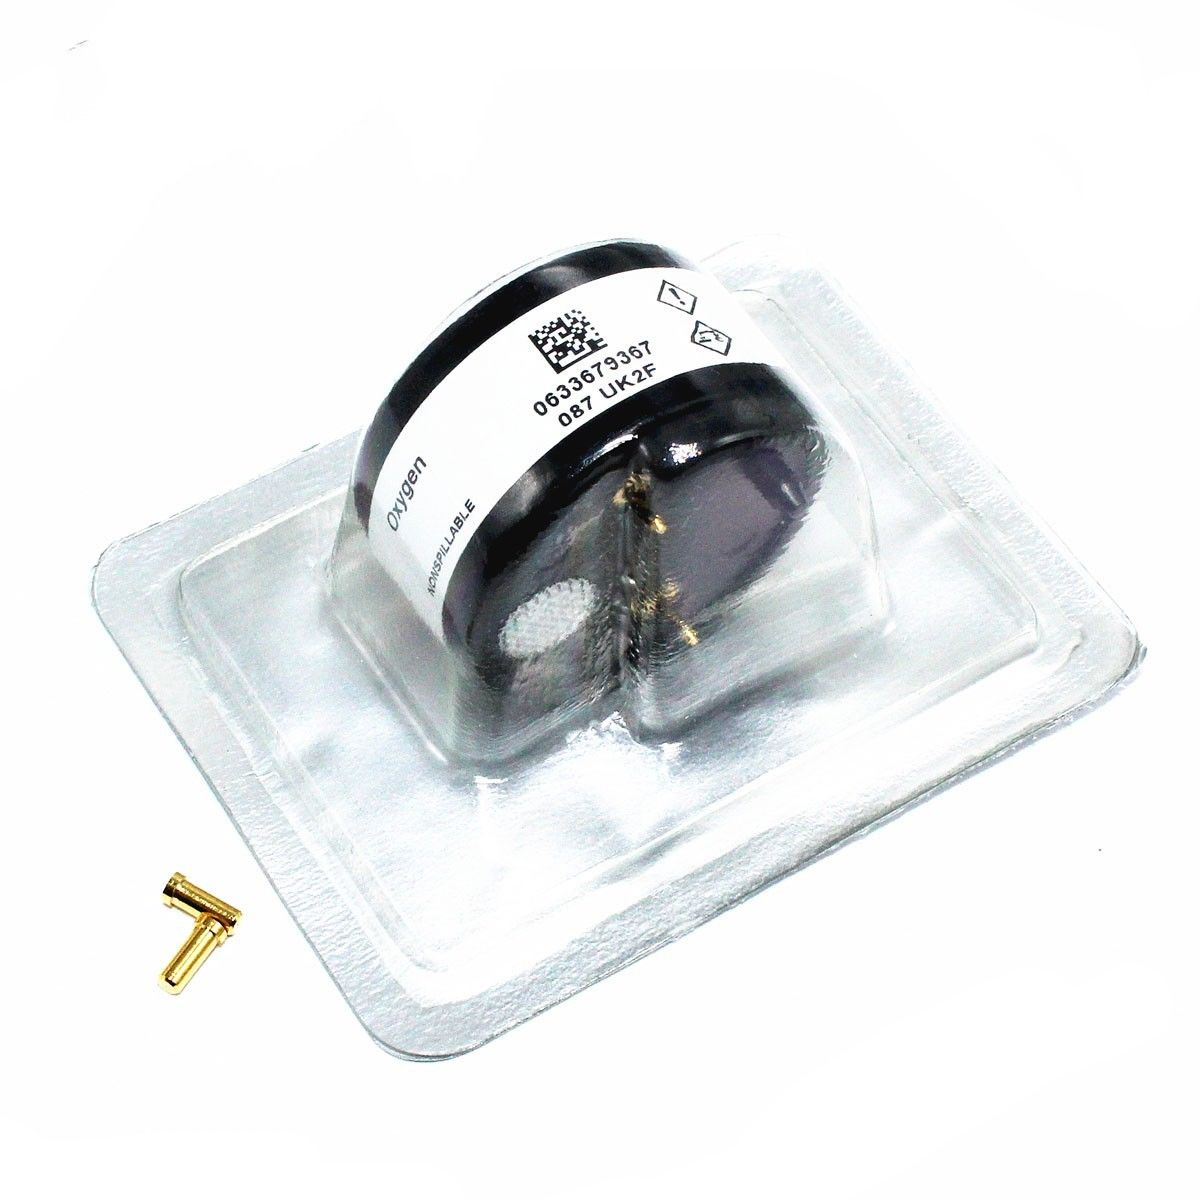 ORIGINAL /& Brand New UK CITY CiTiceL Oxygen Sensor 70X-V 7OX-V 7OX-V 70XV 7OXV